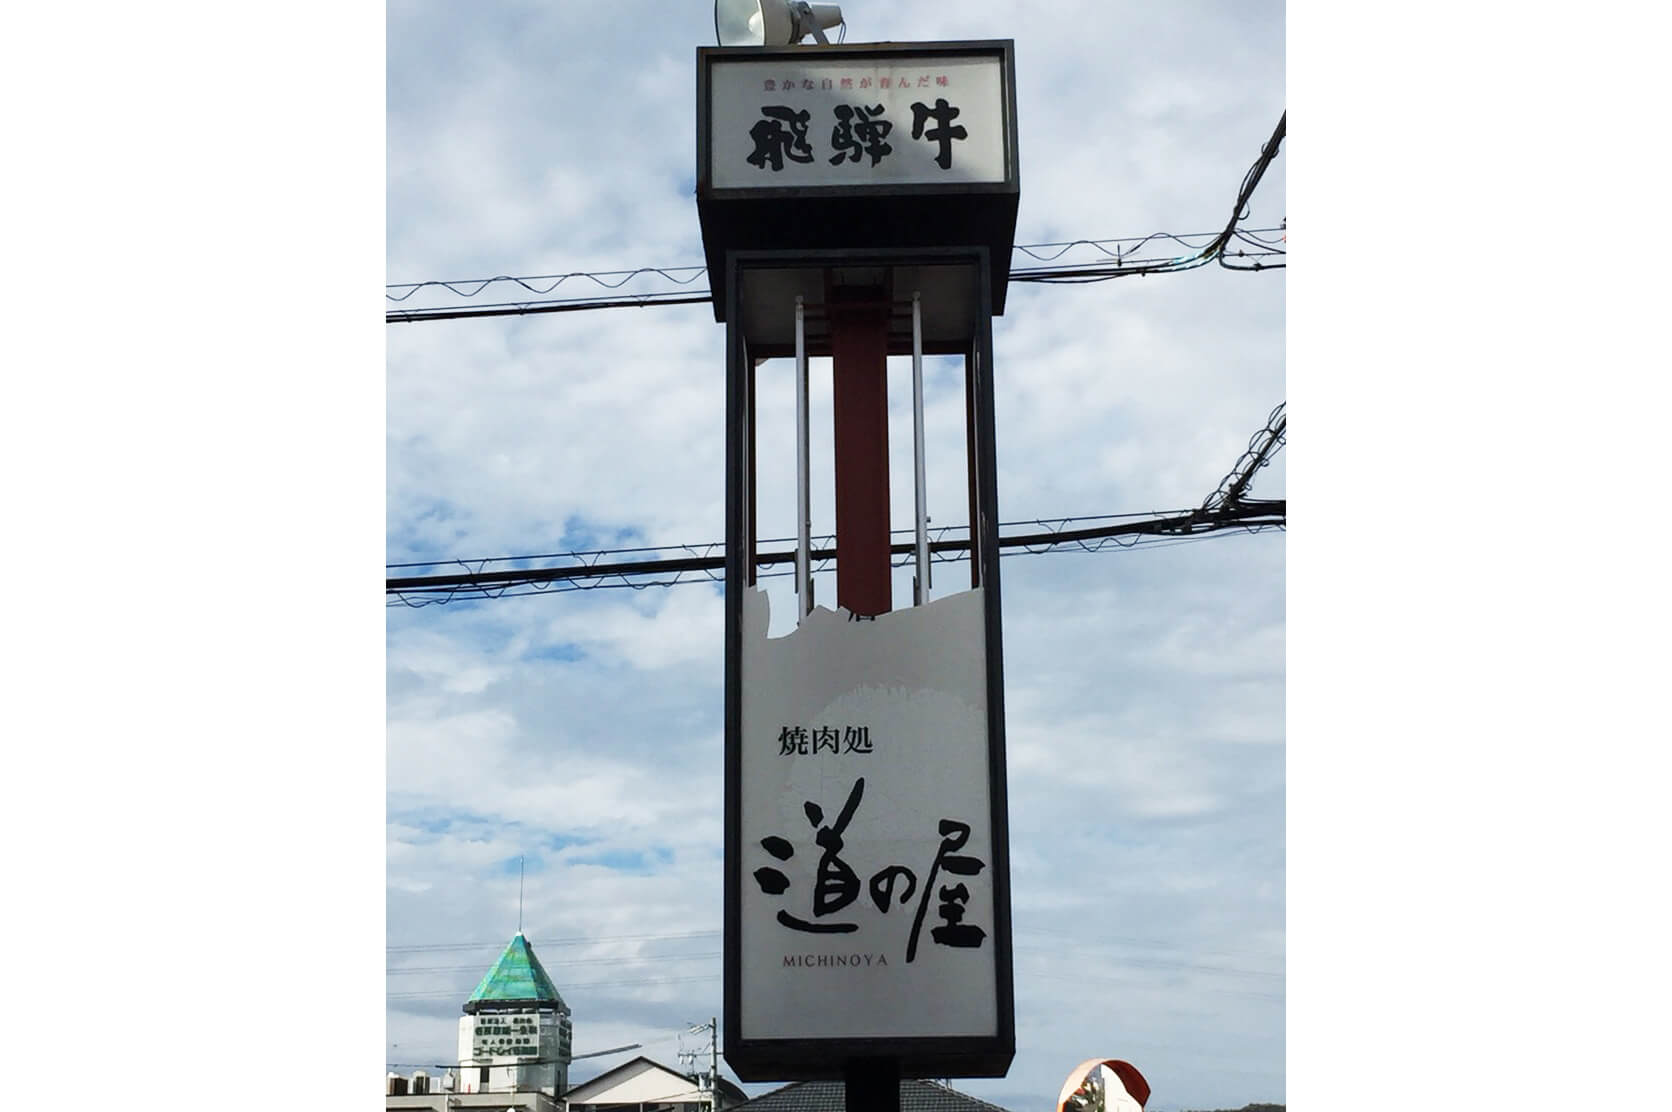 IMG 2381 - 【岐阜県各務原市】焼き肉_道の屋様の看板デザイン製作及び施工を担当させていただきました。